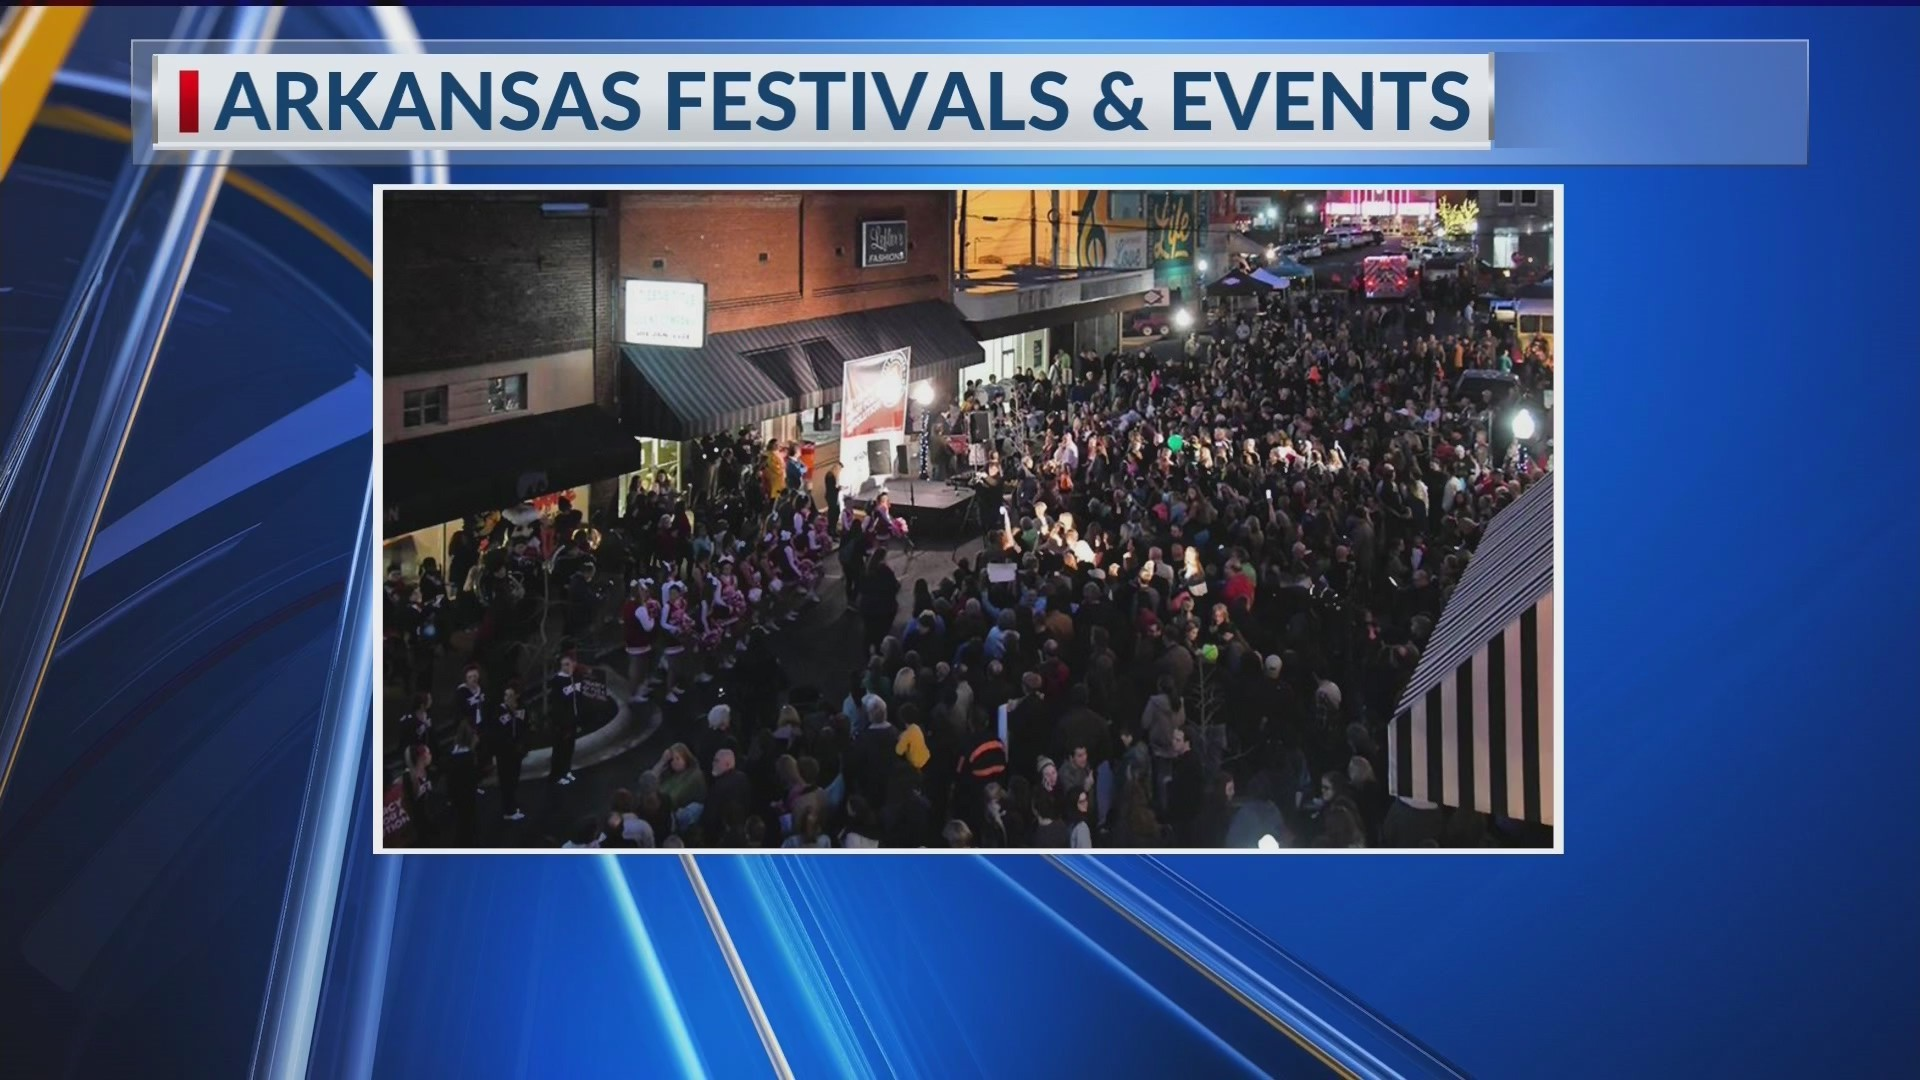 Events_Across_Arkansas_2_8_19_0_20190208194612